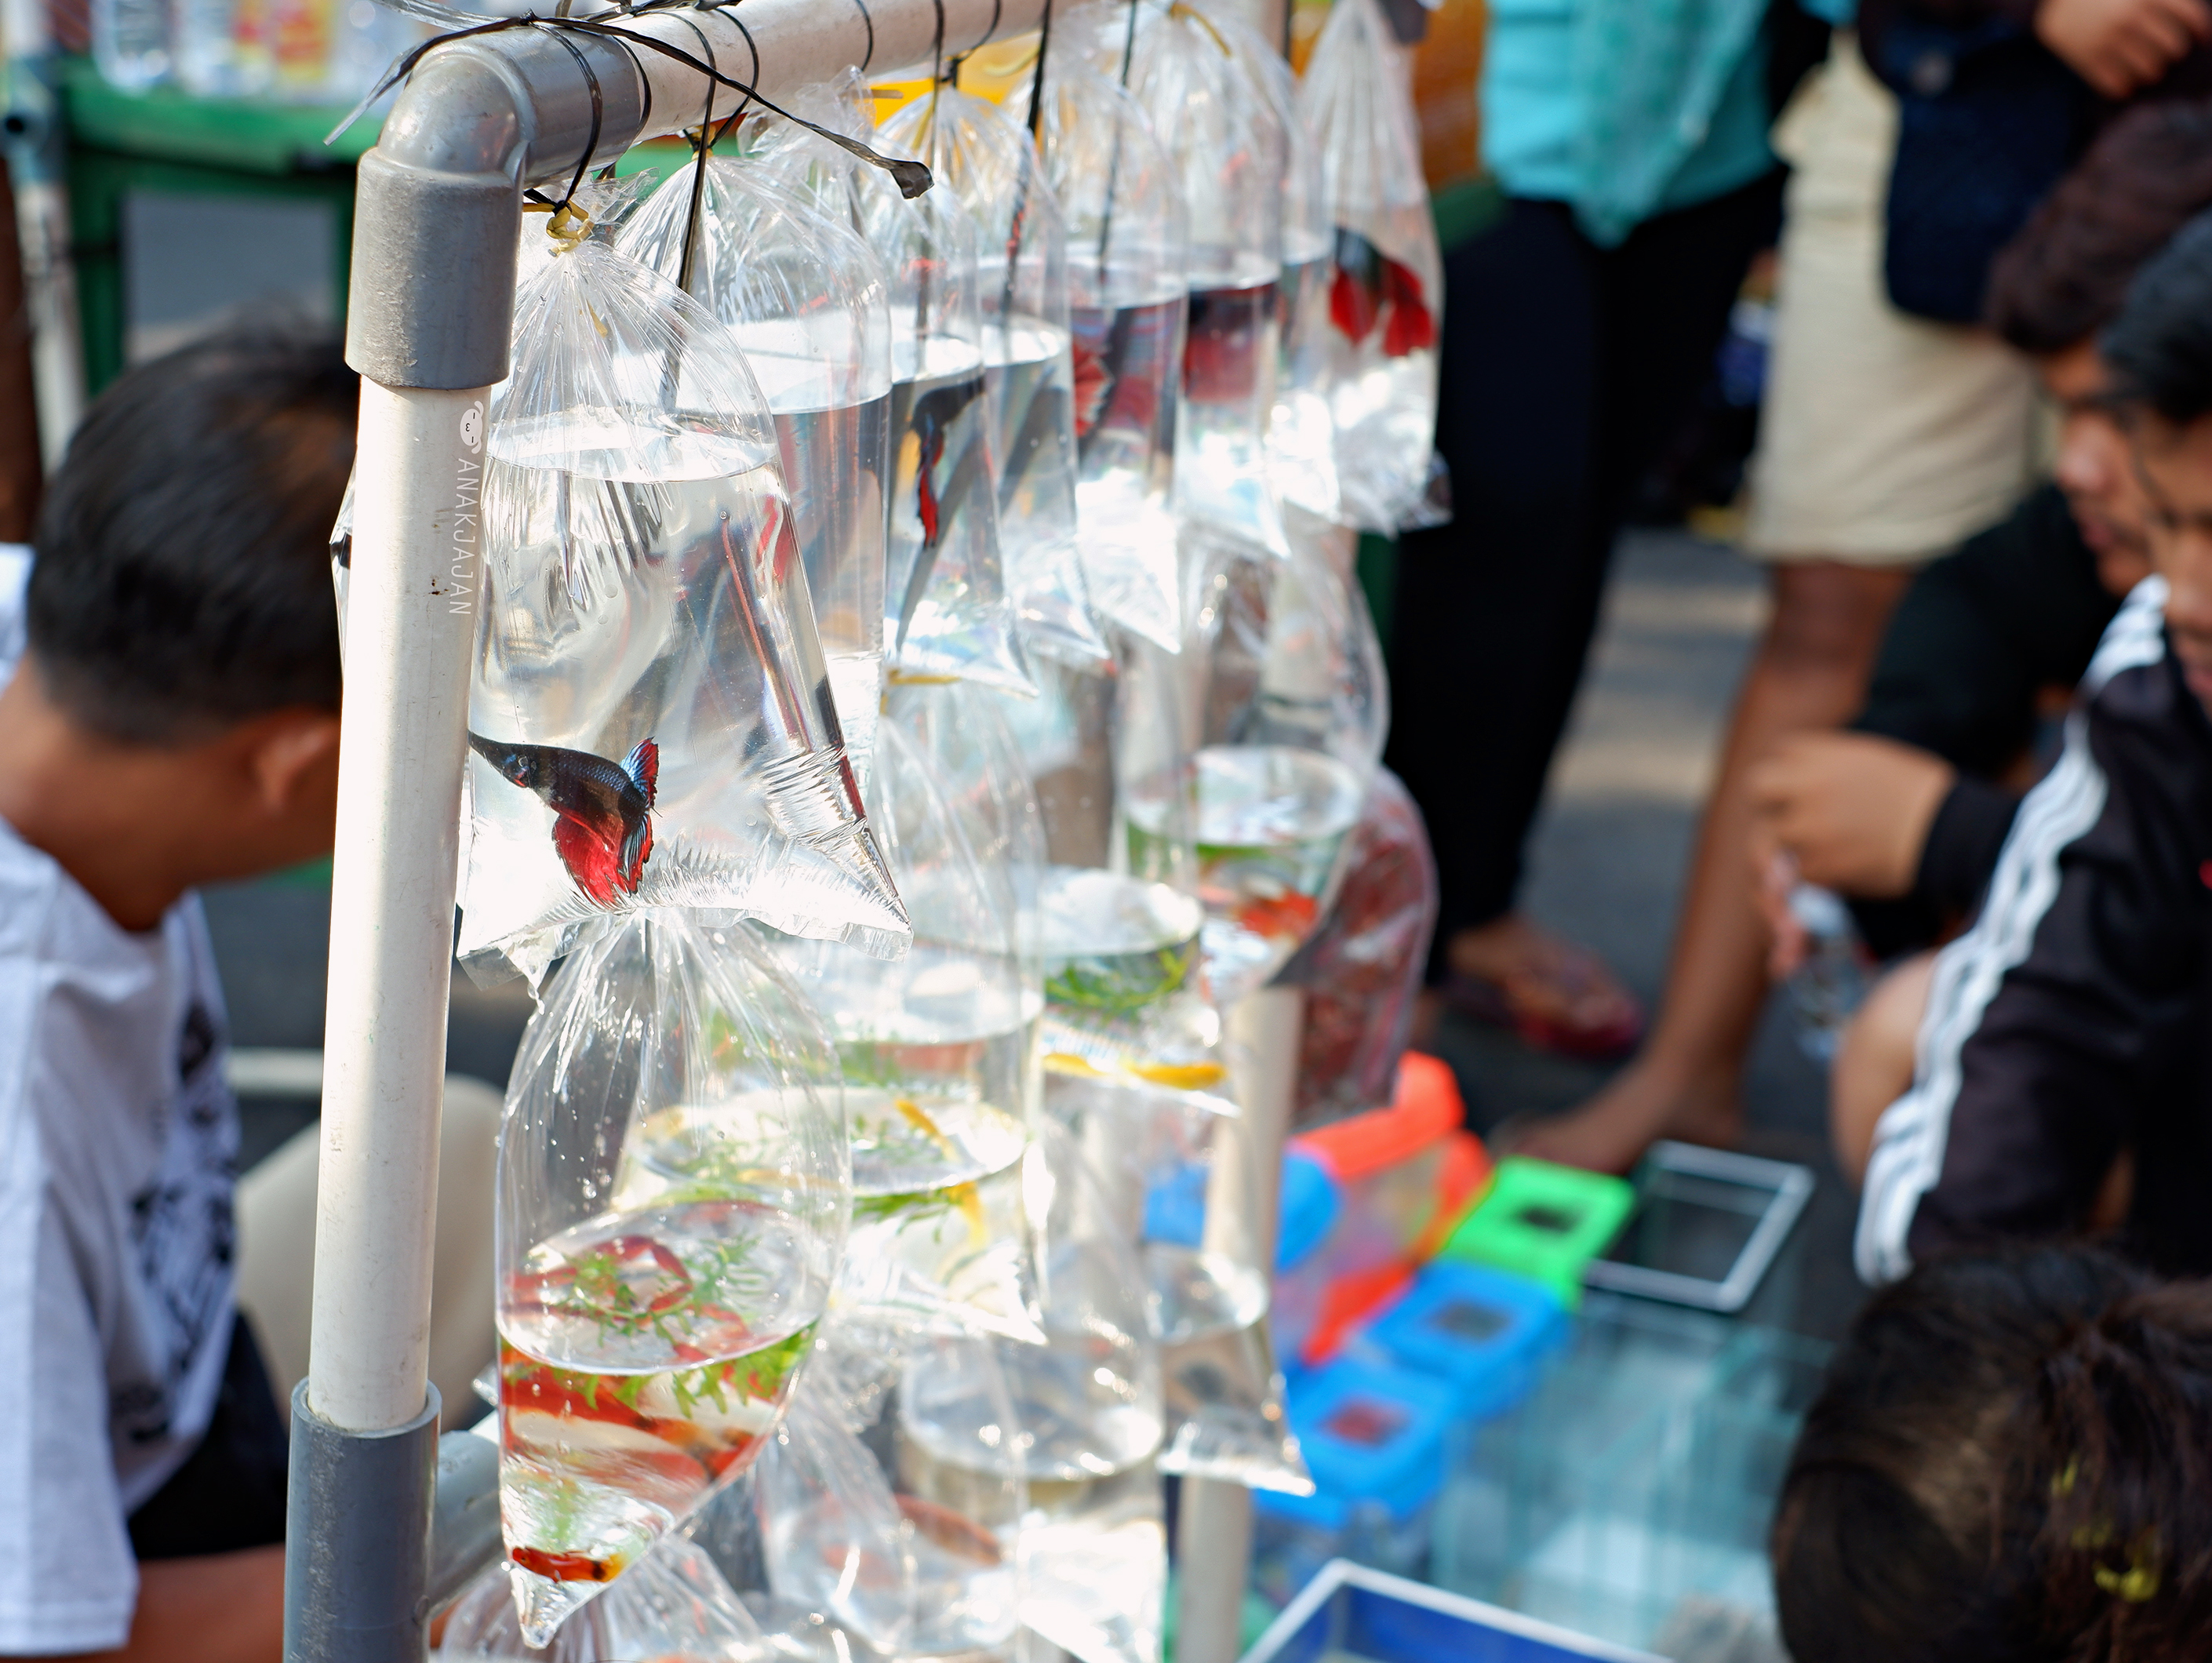 Pring Mas Soto Ayam Surabaya 30 Gr 6pcs Cek Harga Terkini Dan Lulur Sinangling Rm 25 Dscf7614